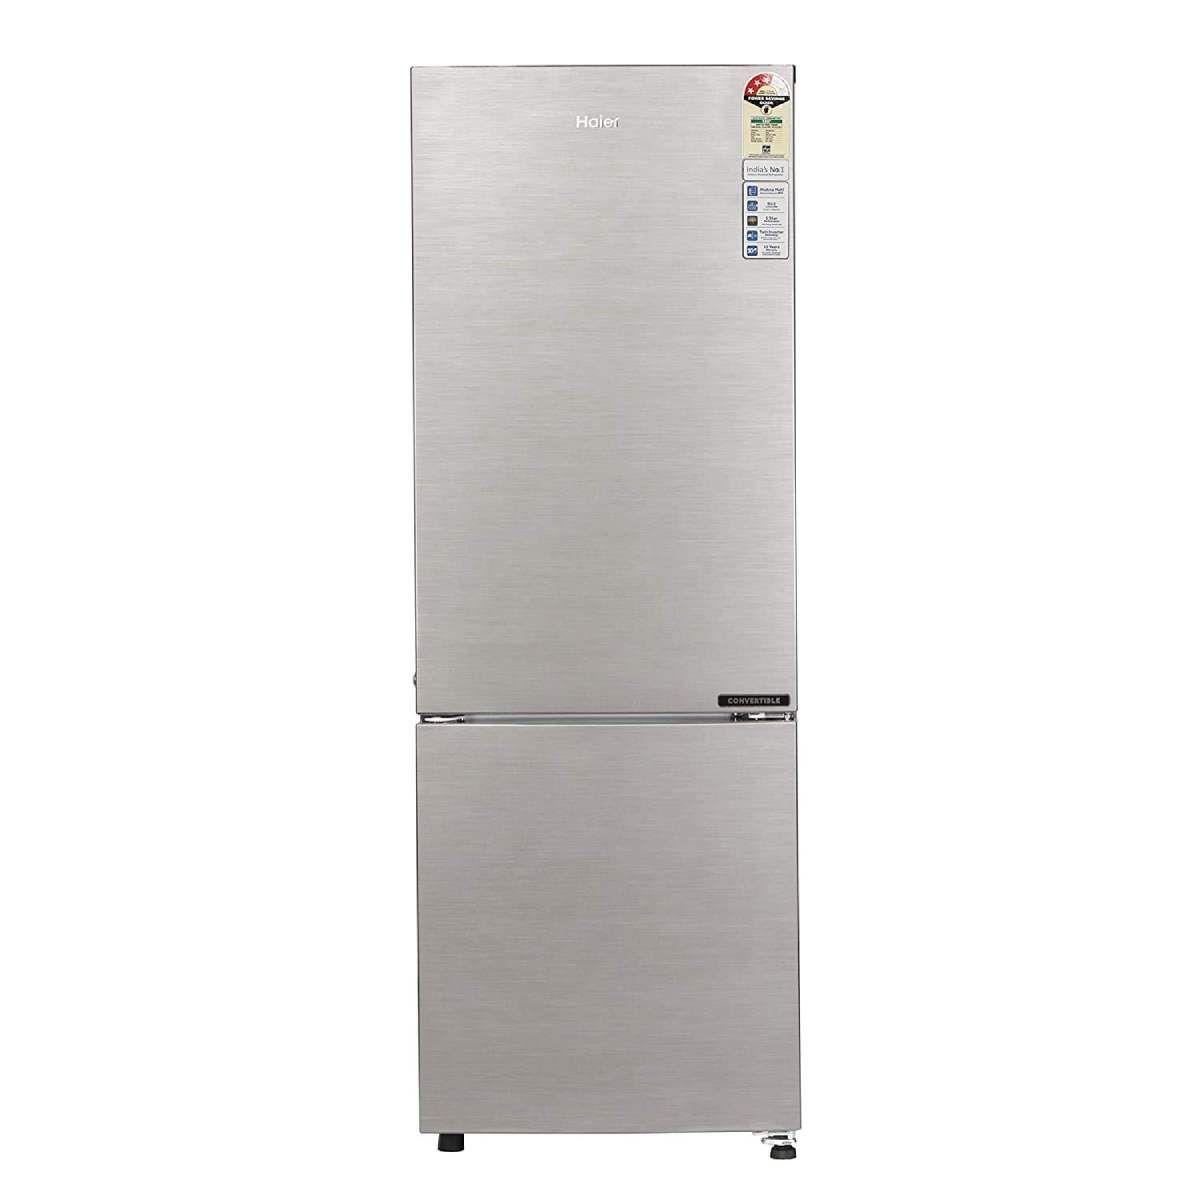 Haier 256 L 3 Star Double Door Refrigerator (HEB-25TDS-E)